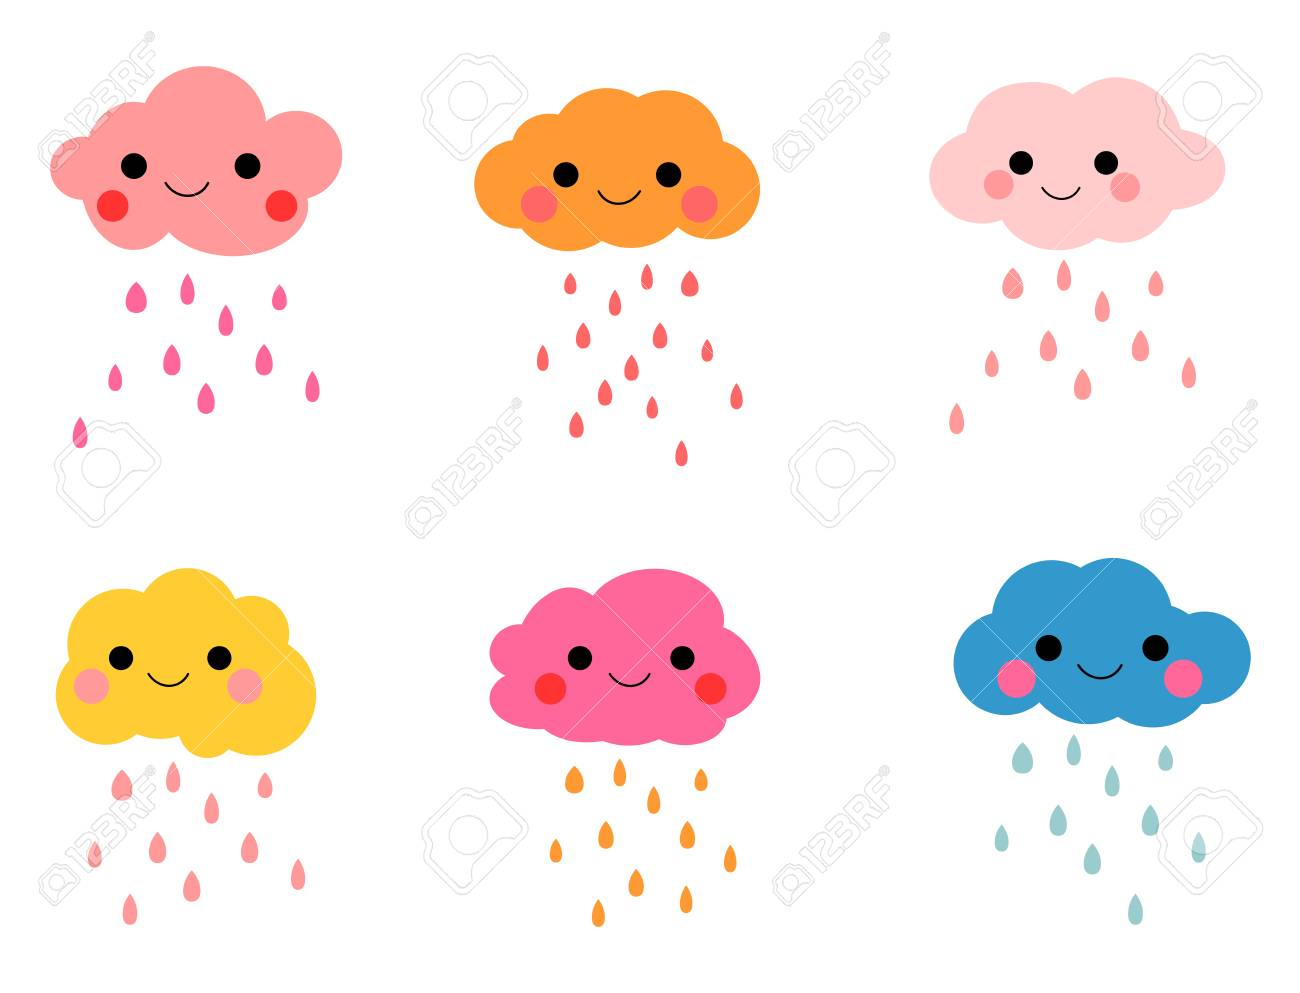 cute colorful rain clouds with smiling faces royalty free cliparts rh 123rf com cartoon rain cloud gif cartoon rain cloud gif